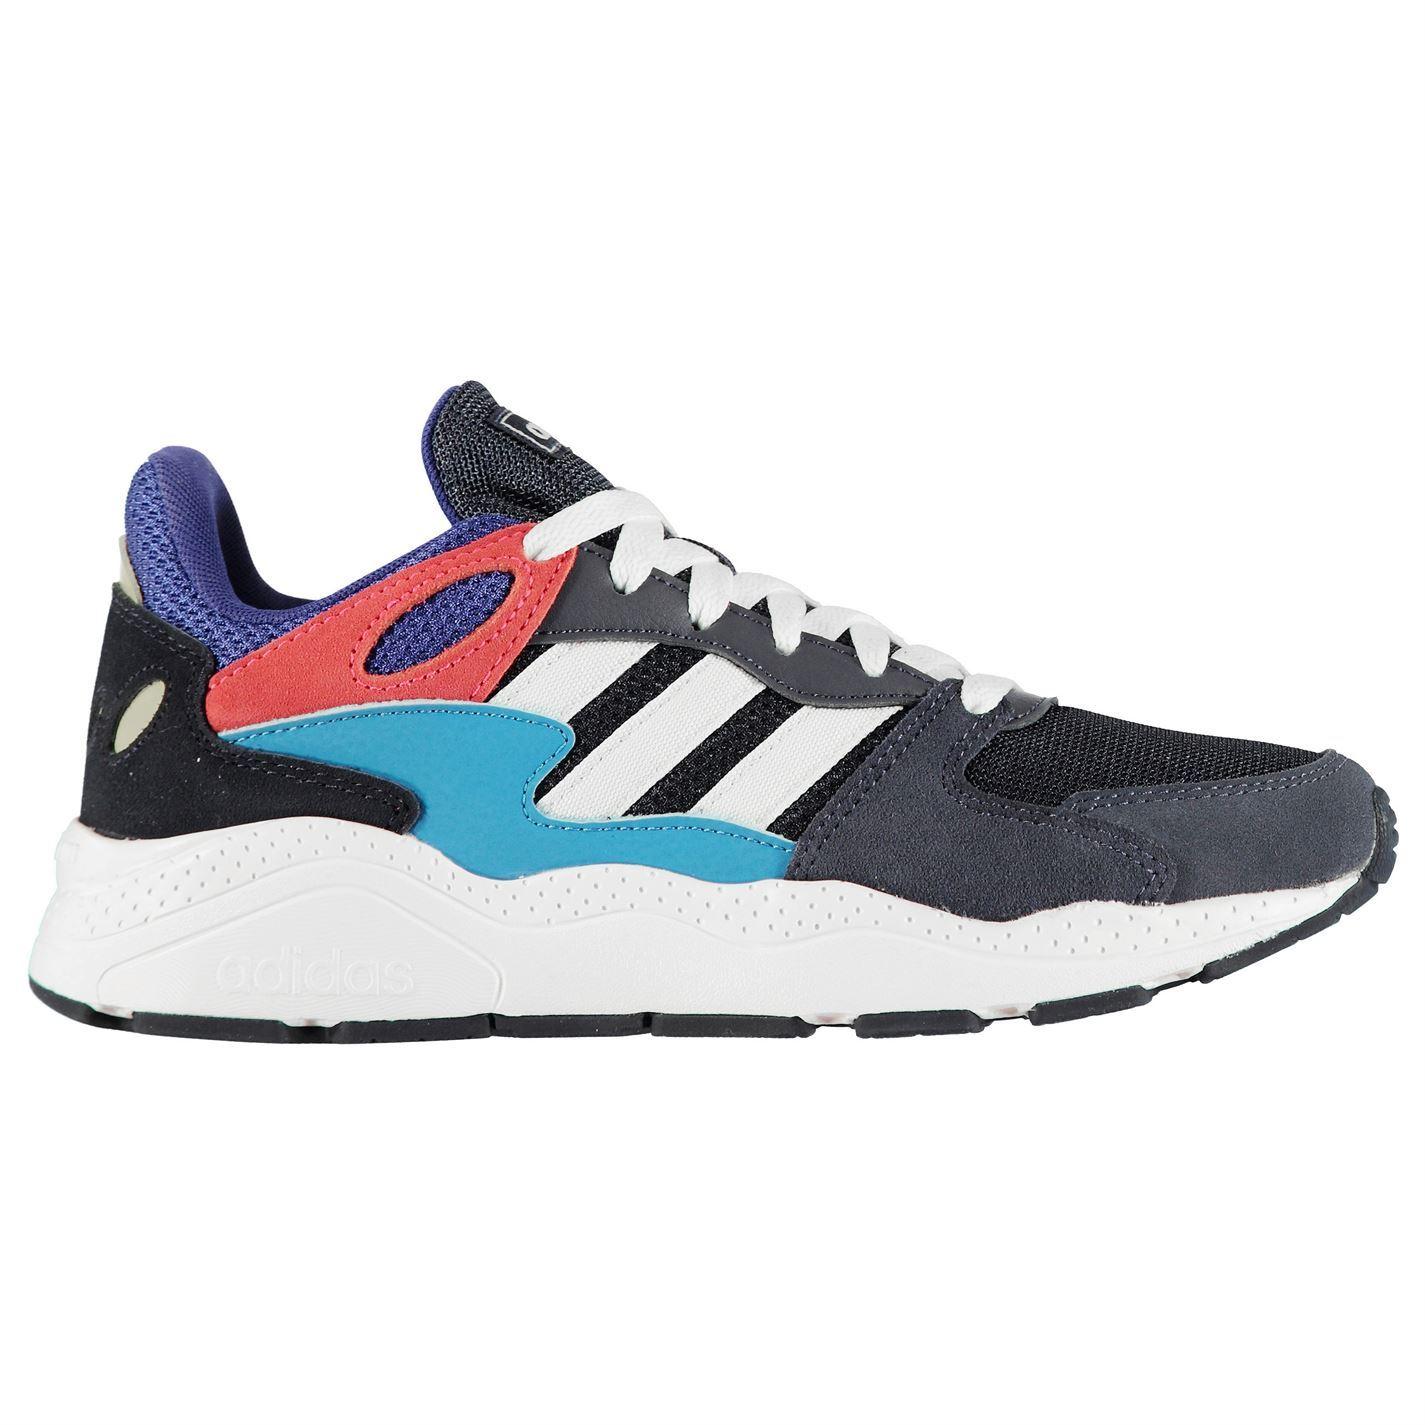 Adidas-Crazychaos-Baskets-Homme-Chaussures-De-Loisirs-Chaussures-Baskets miniature 19